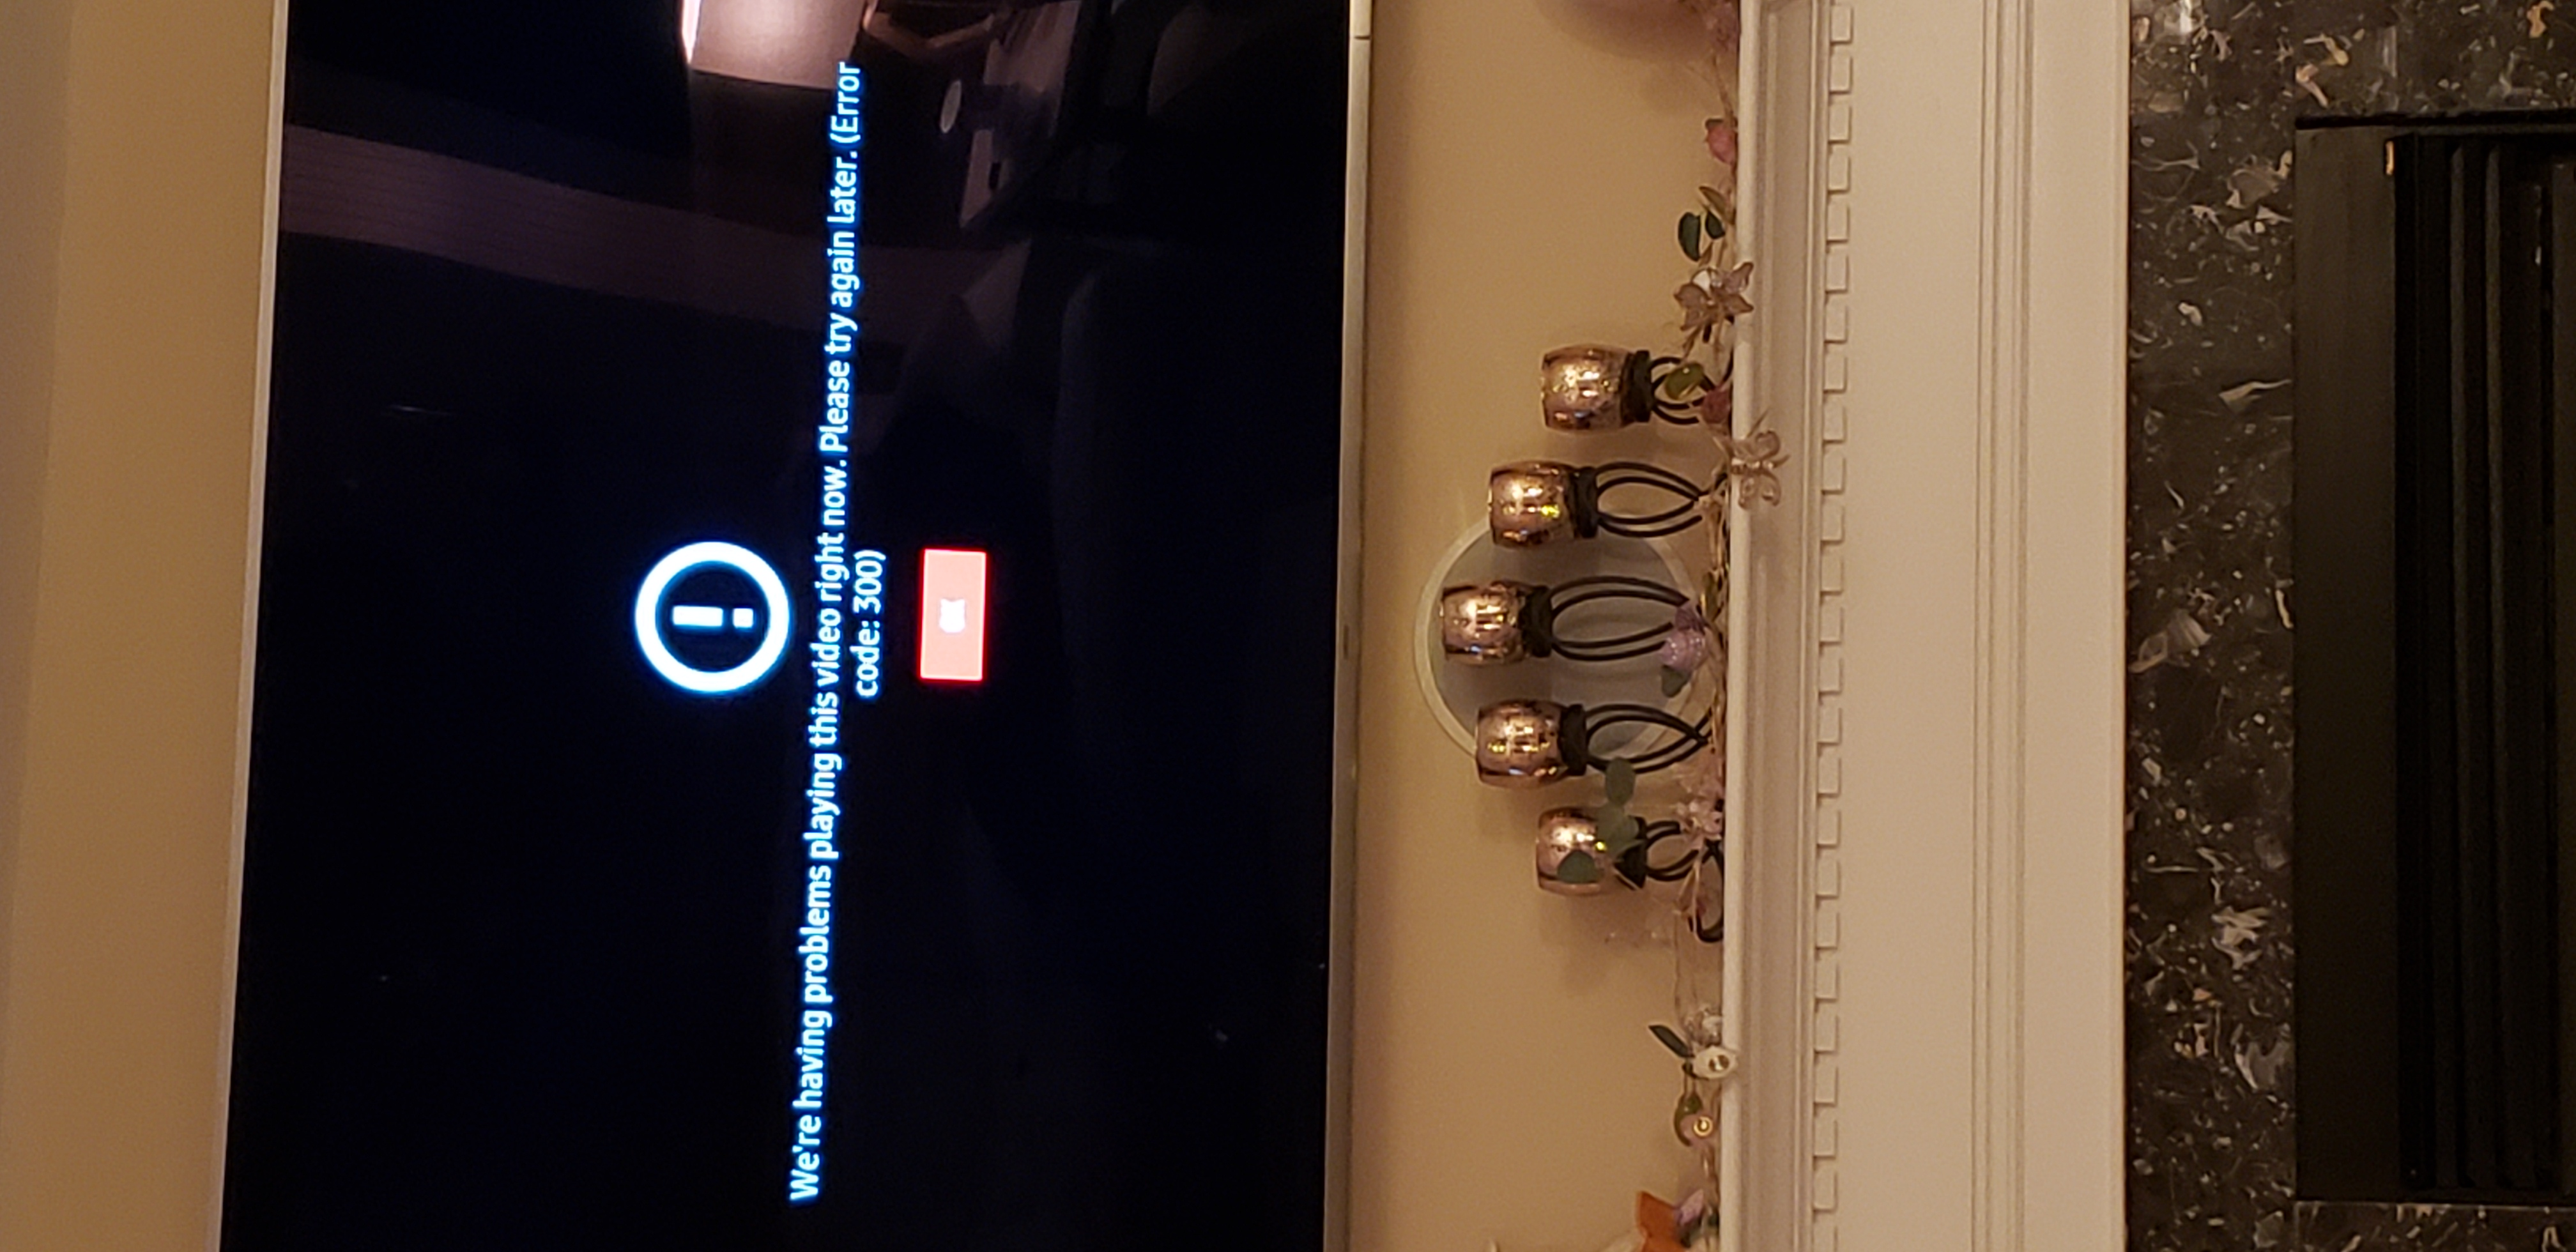 Movie will not play get error code 300 - Google Play Help